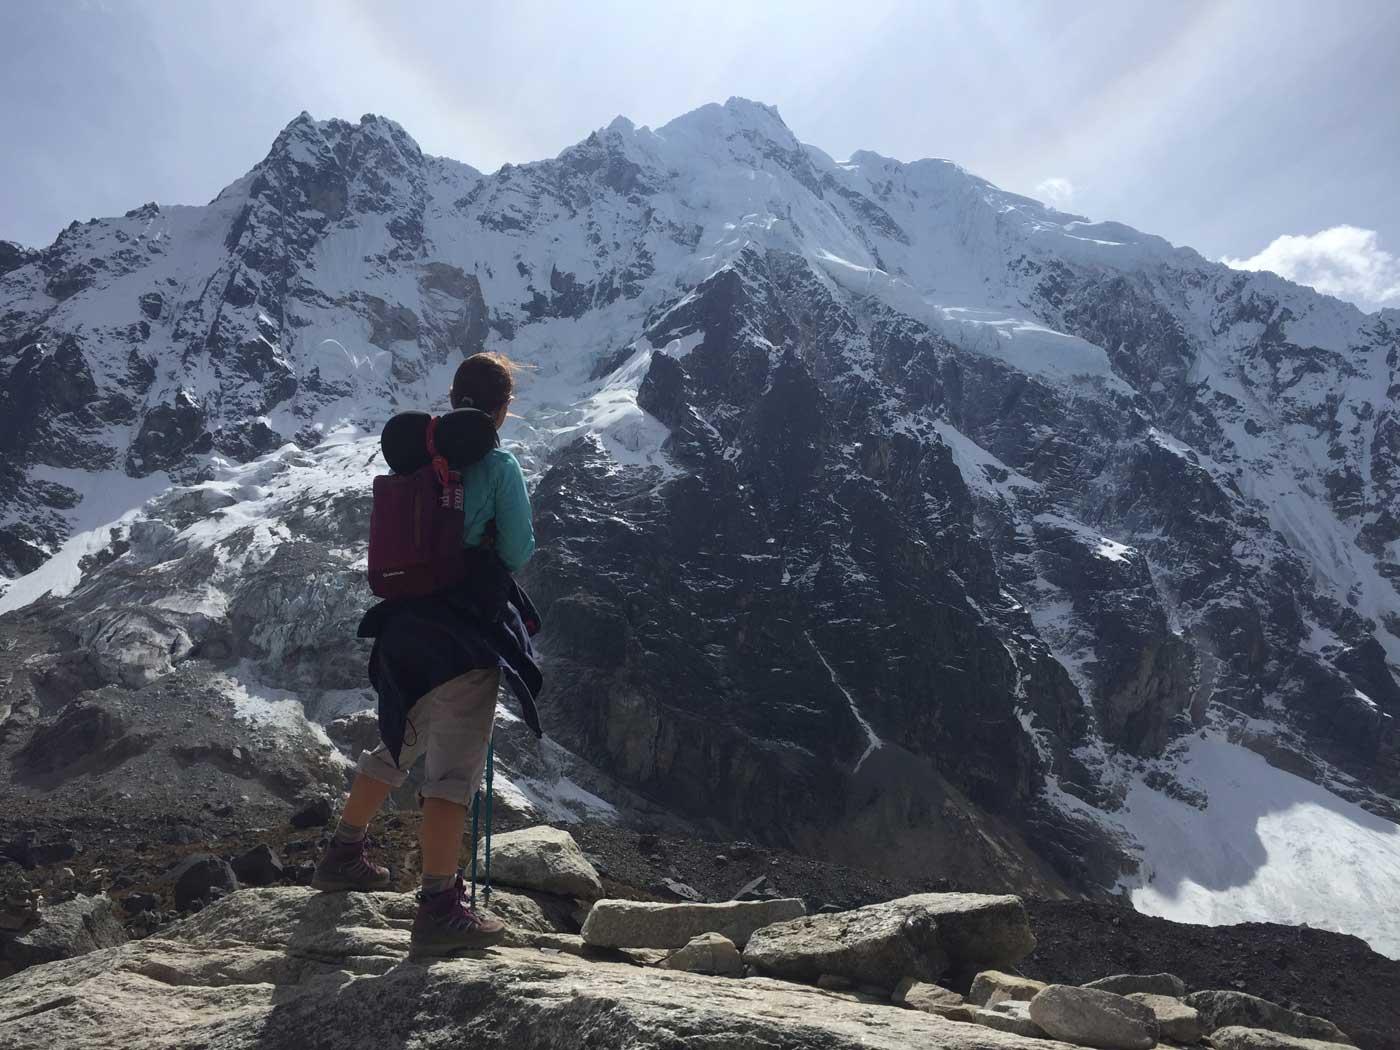 Foto de Iuliana Trifu efectuada en el viaje a Perú